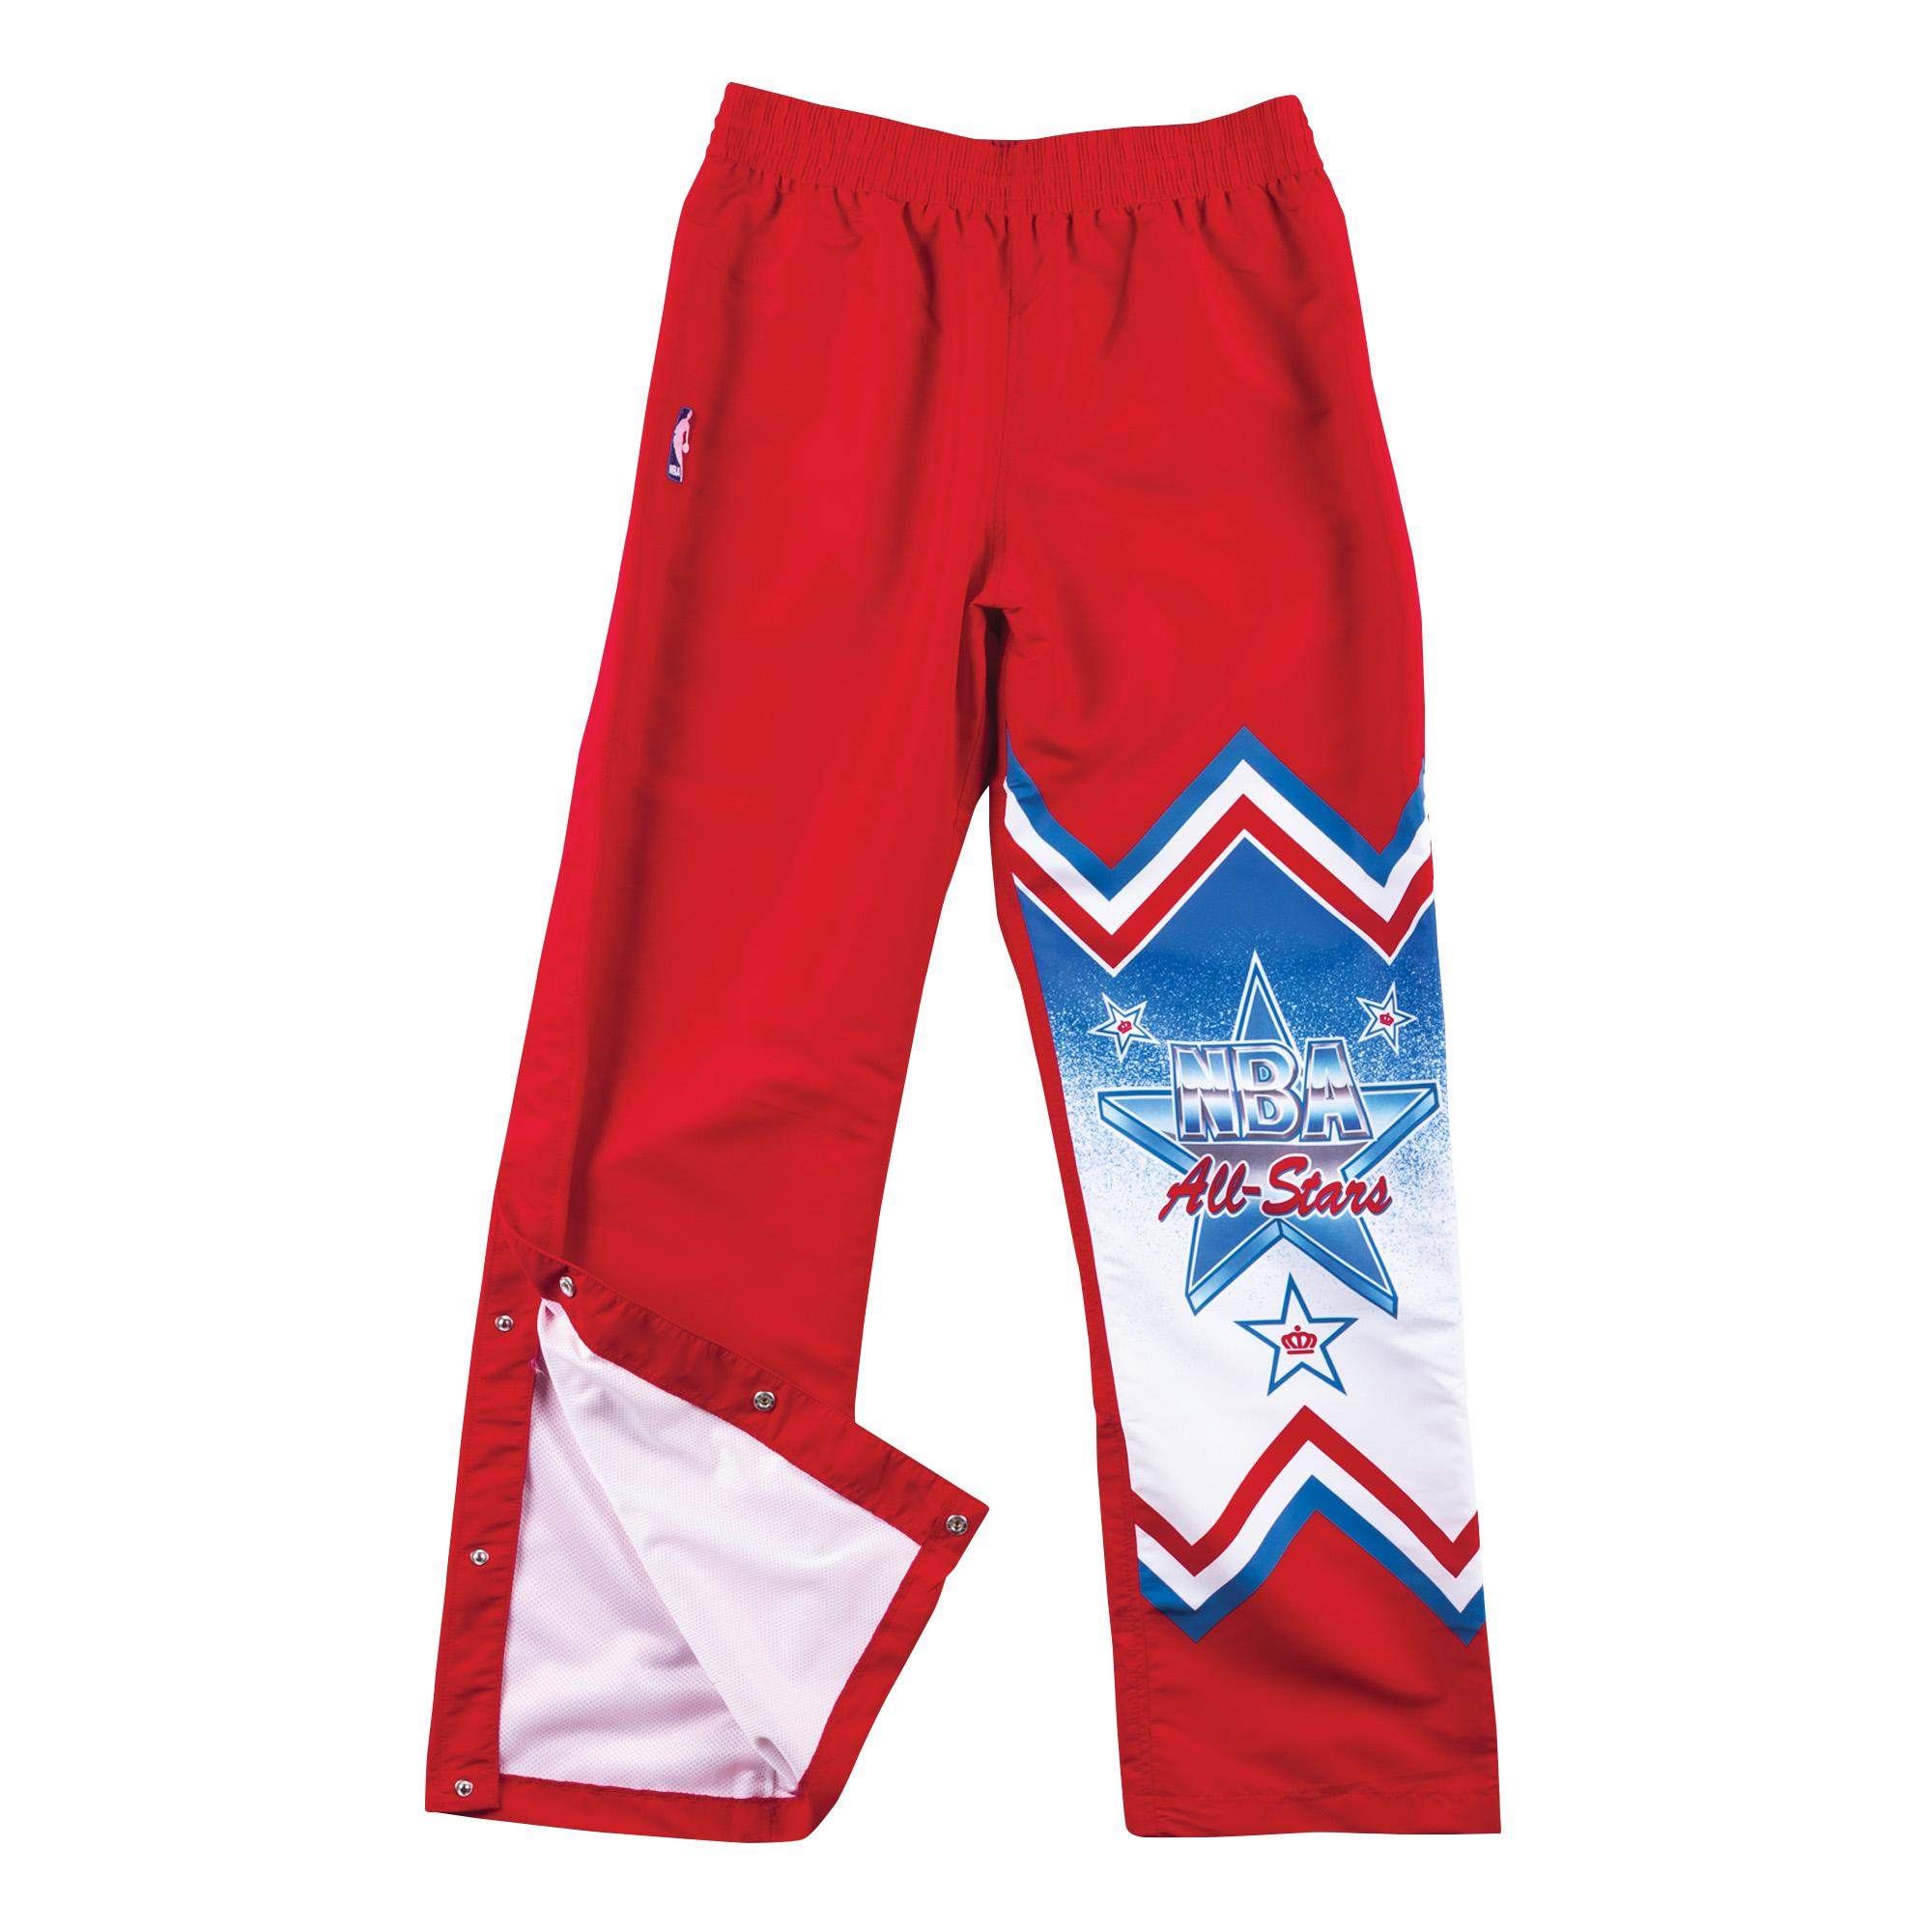 All Star Warm Up Pants West 1991 NBA All-Star a36f76a2d